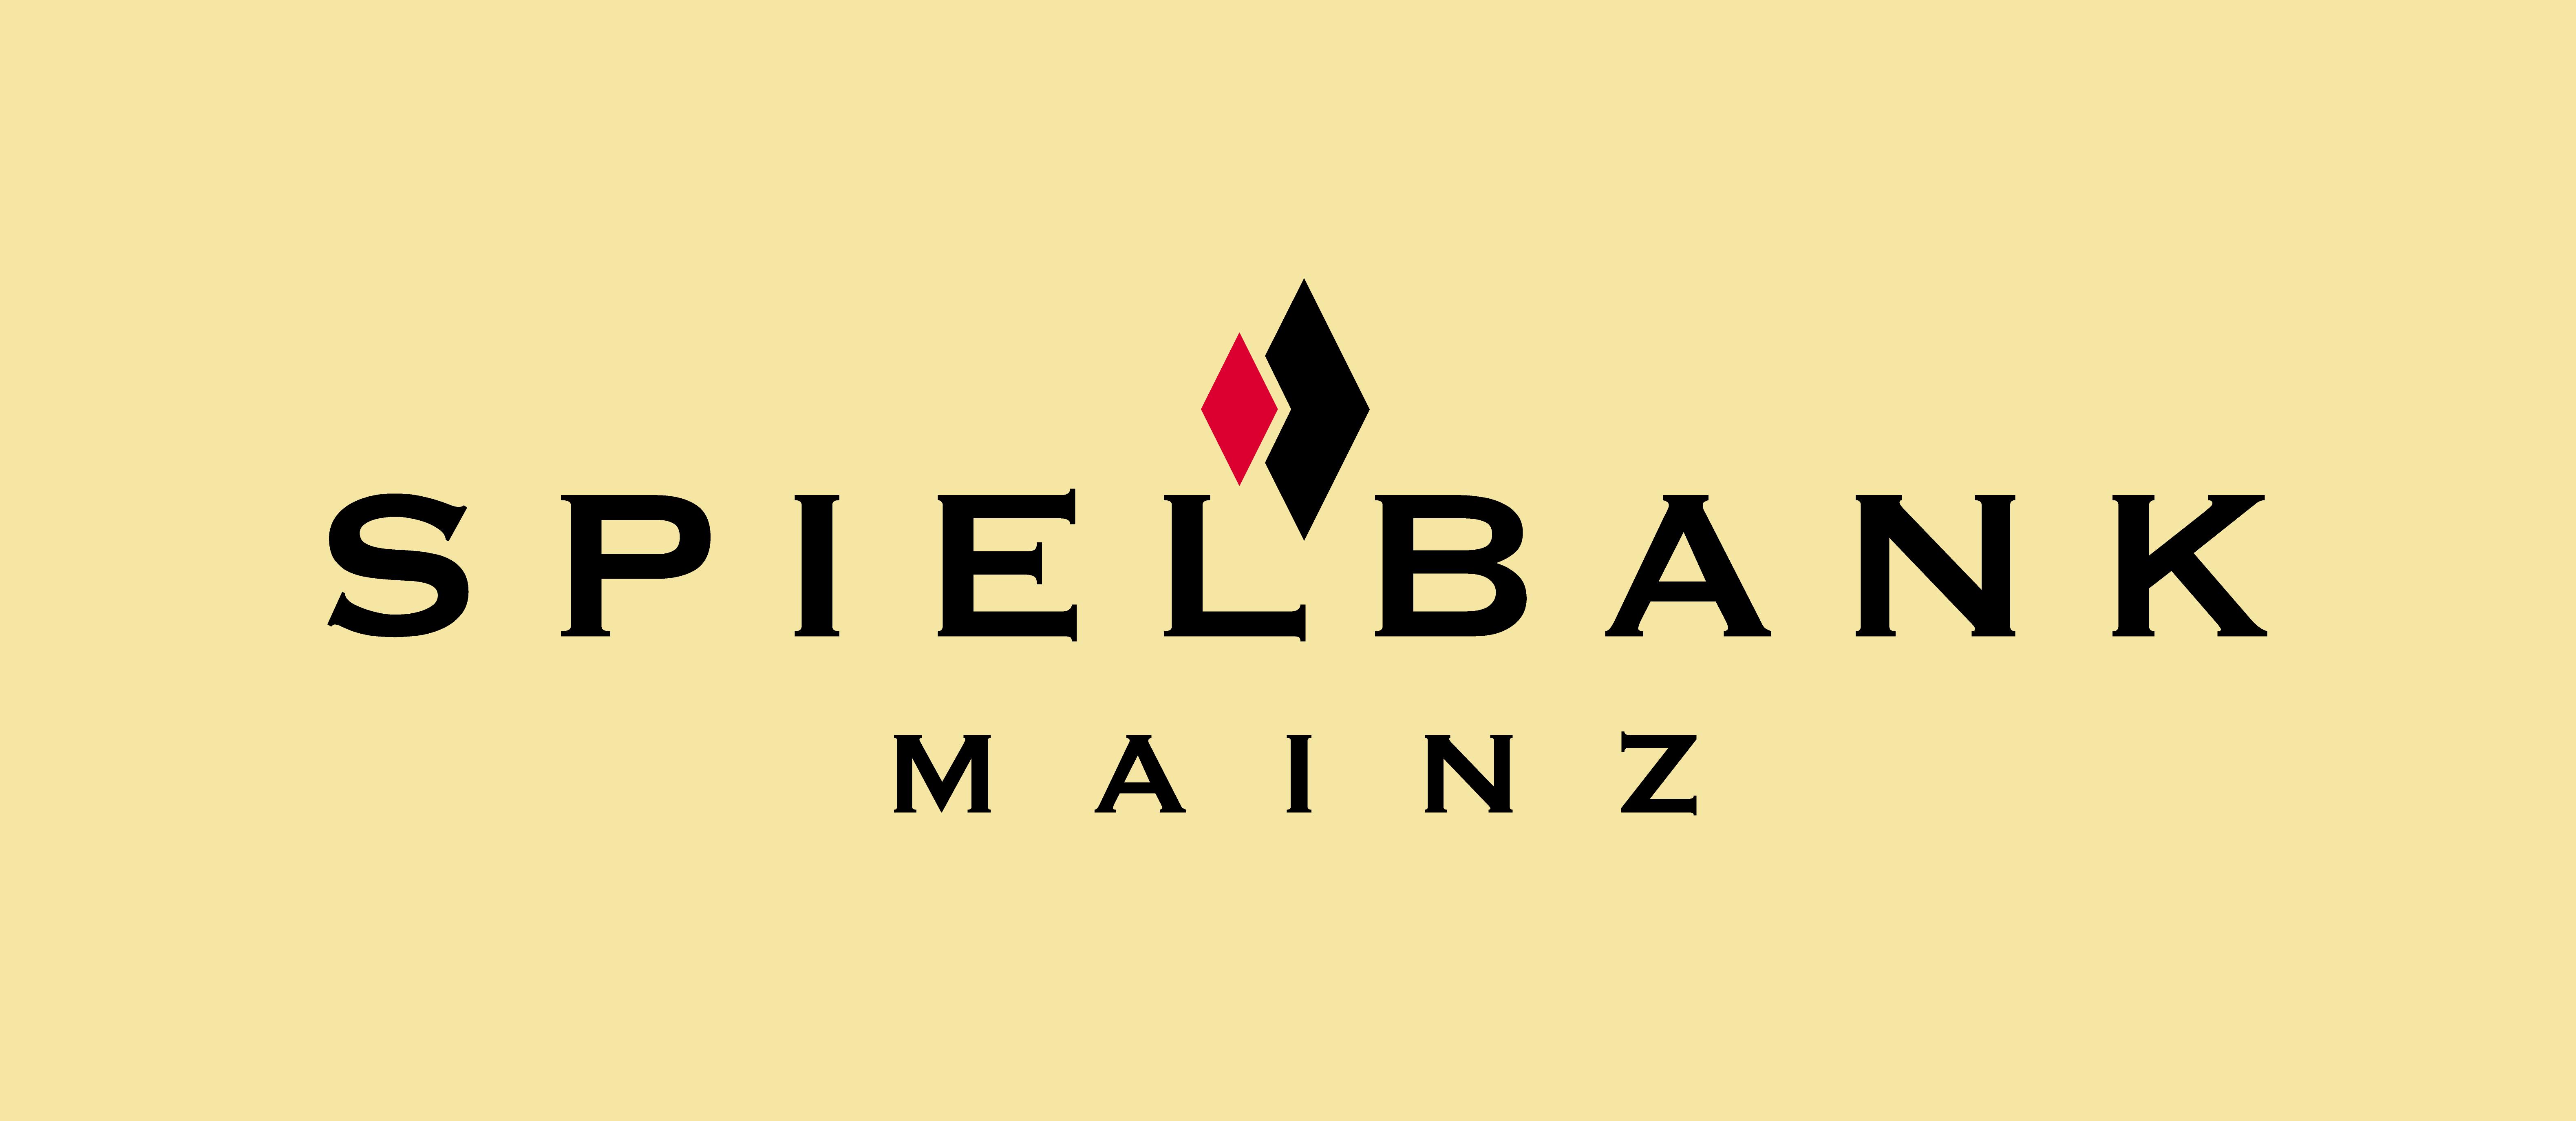 Spielbank Mainz ComeOn Casino -704117